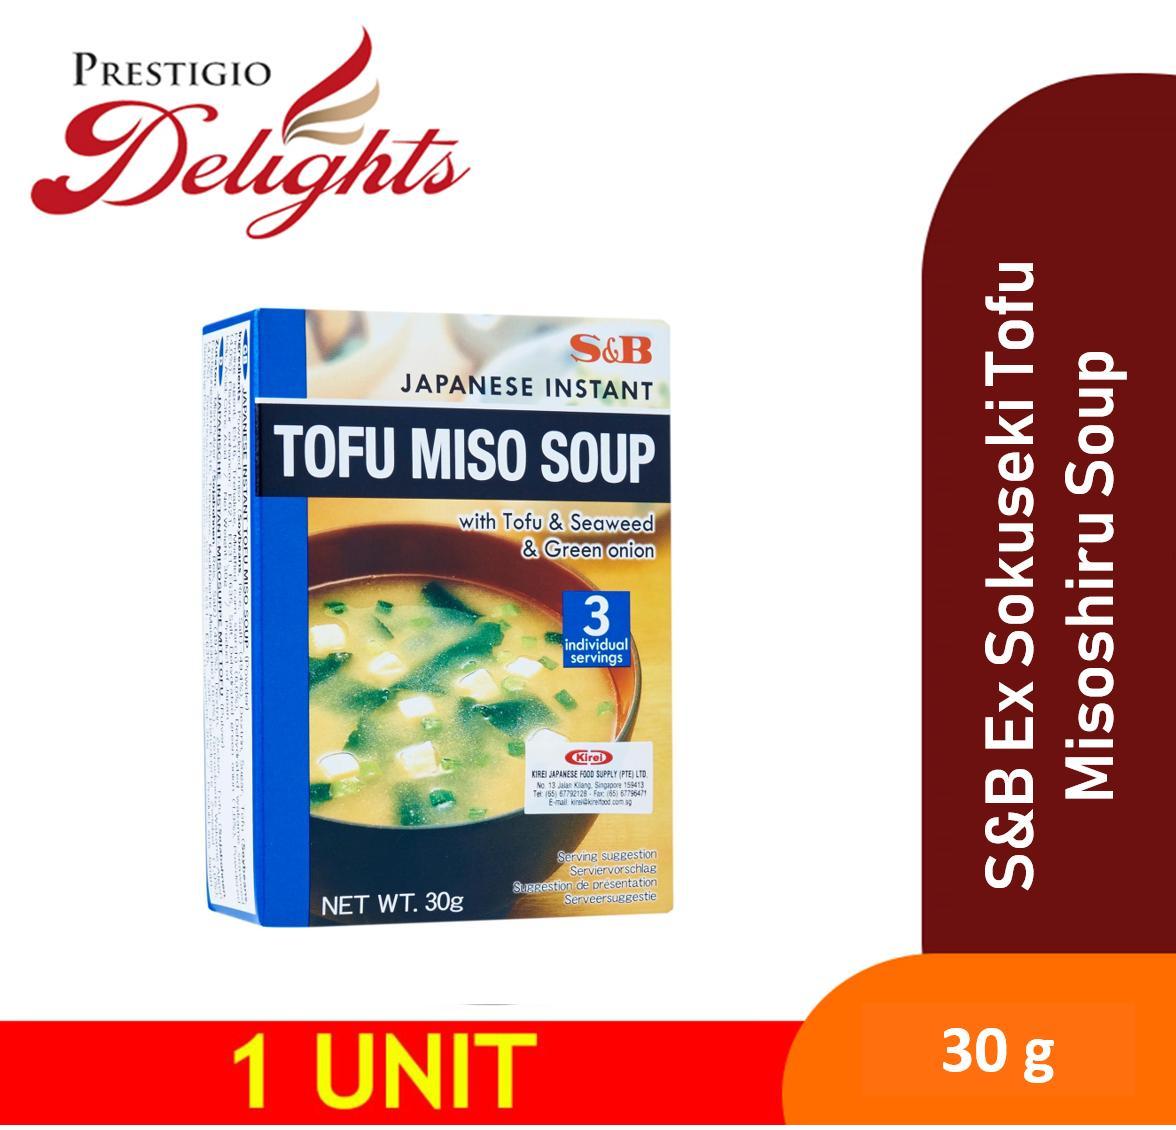 S&b Ex Sokuseki Tofu Misoshiru Soup 30g (tofu & Seaweed & Green Onion) By Prestigio Delights.